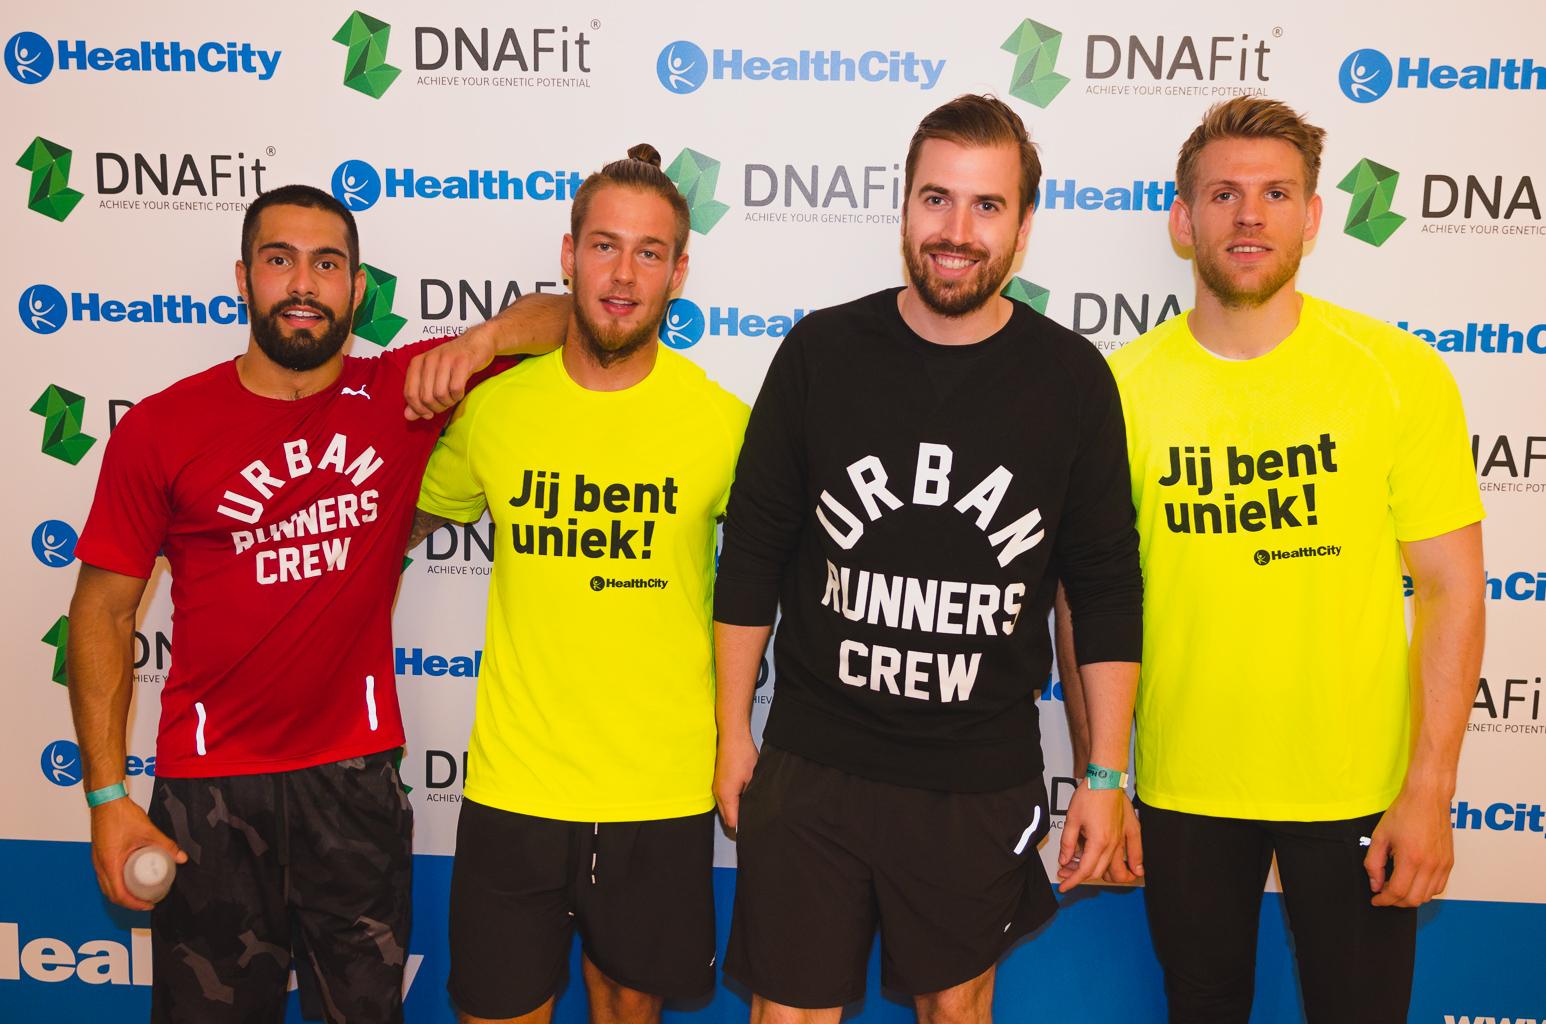 20140917 Healthcity DNAFit-040